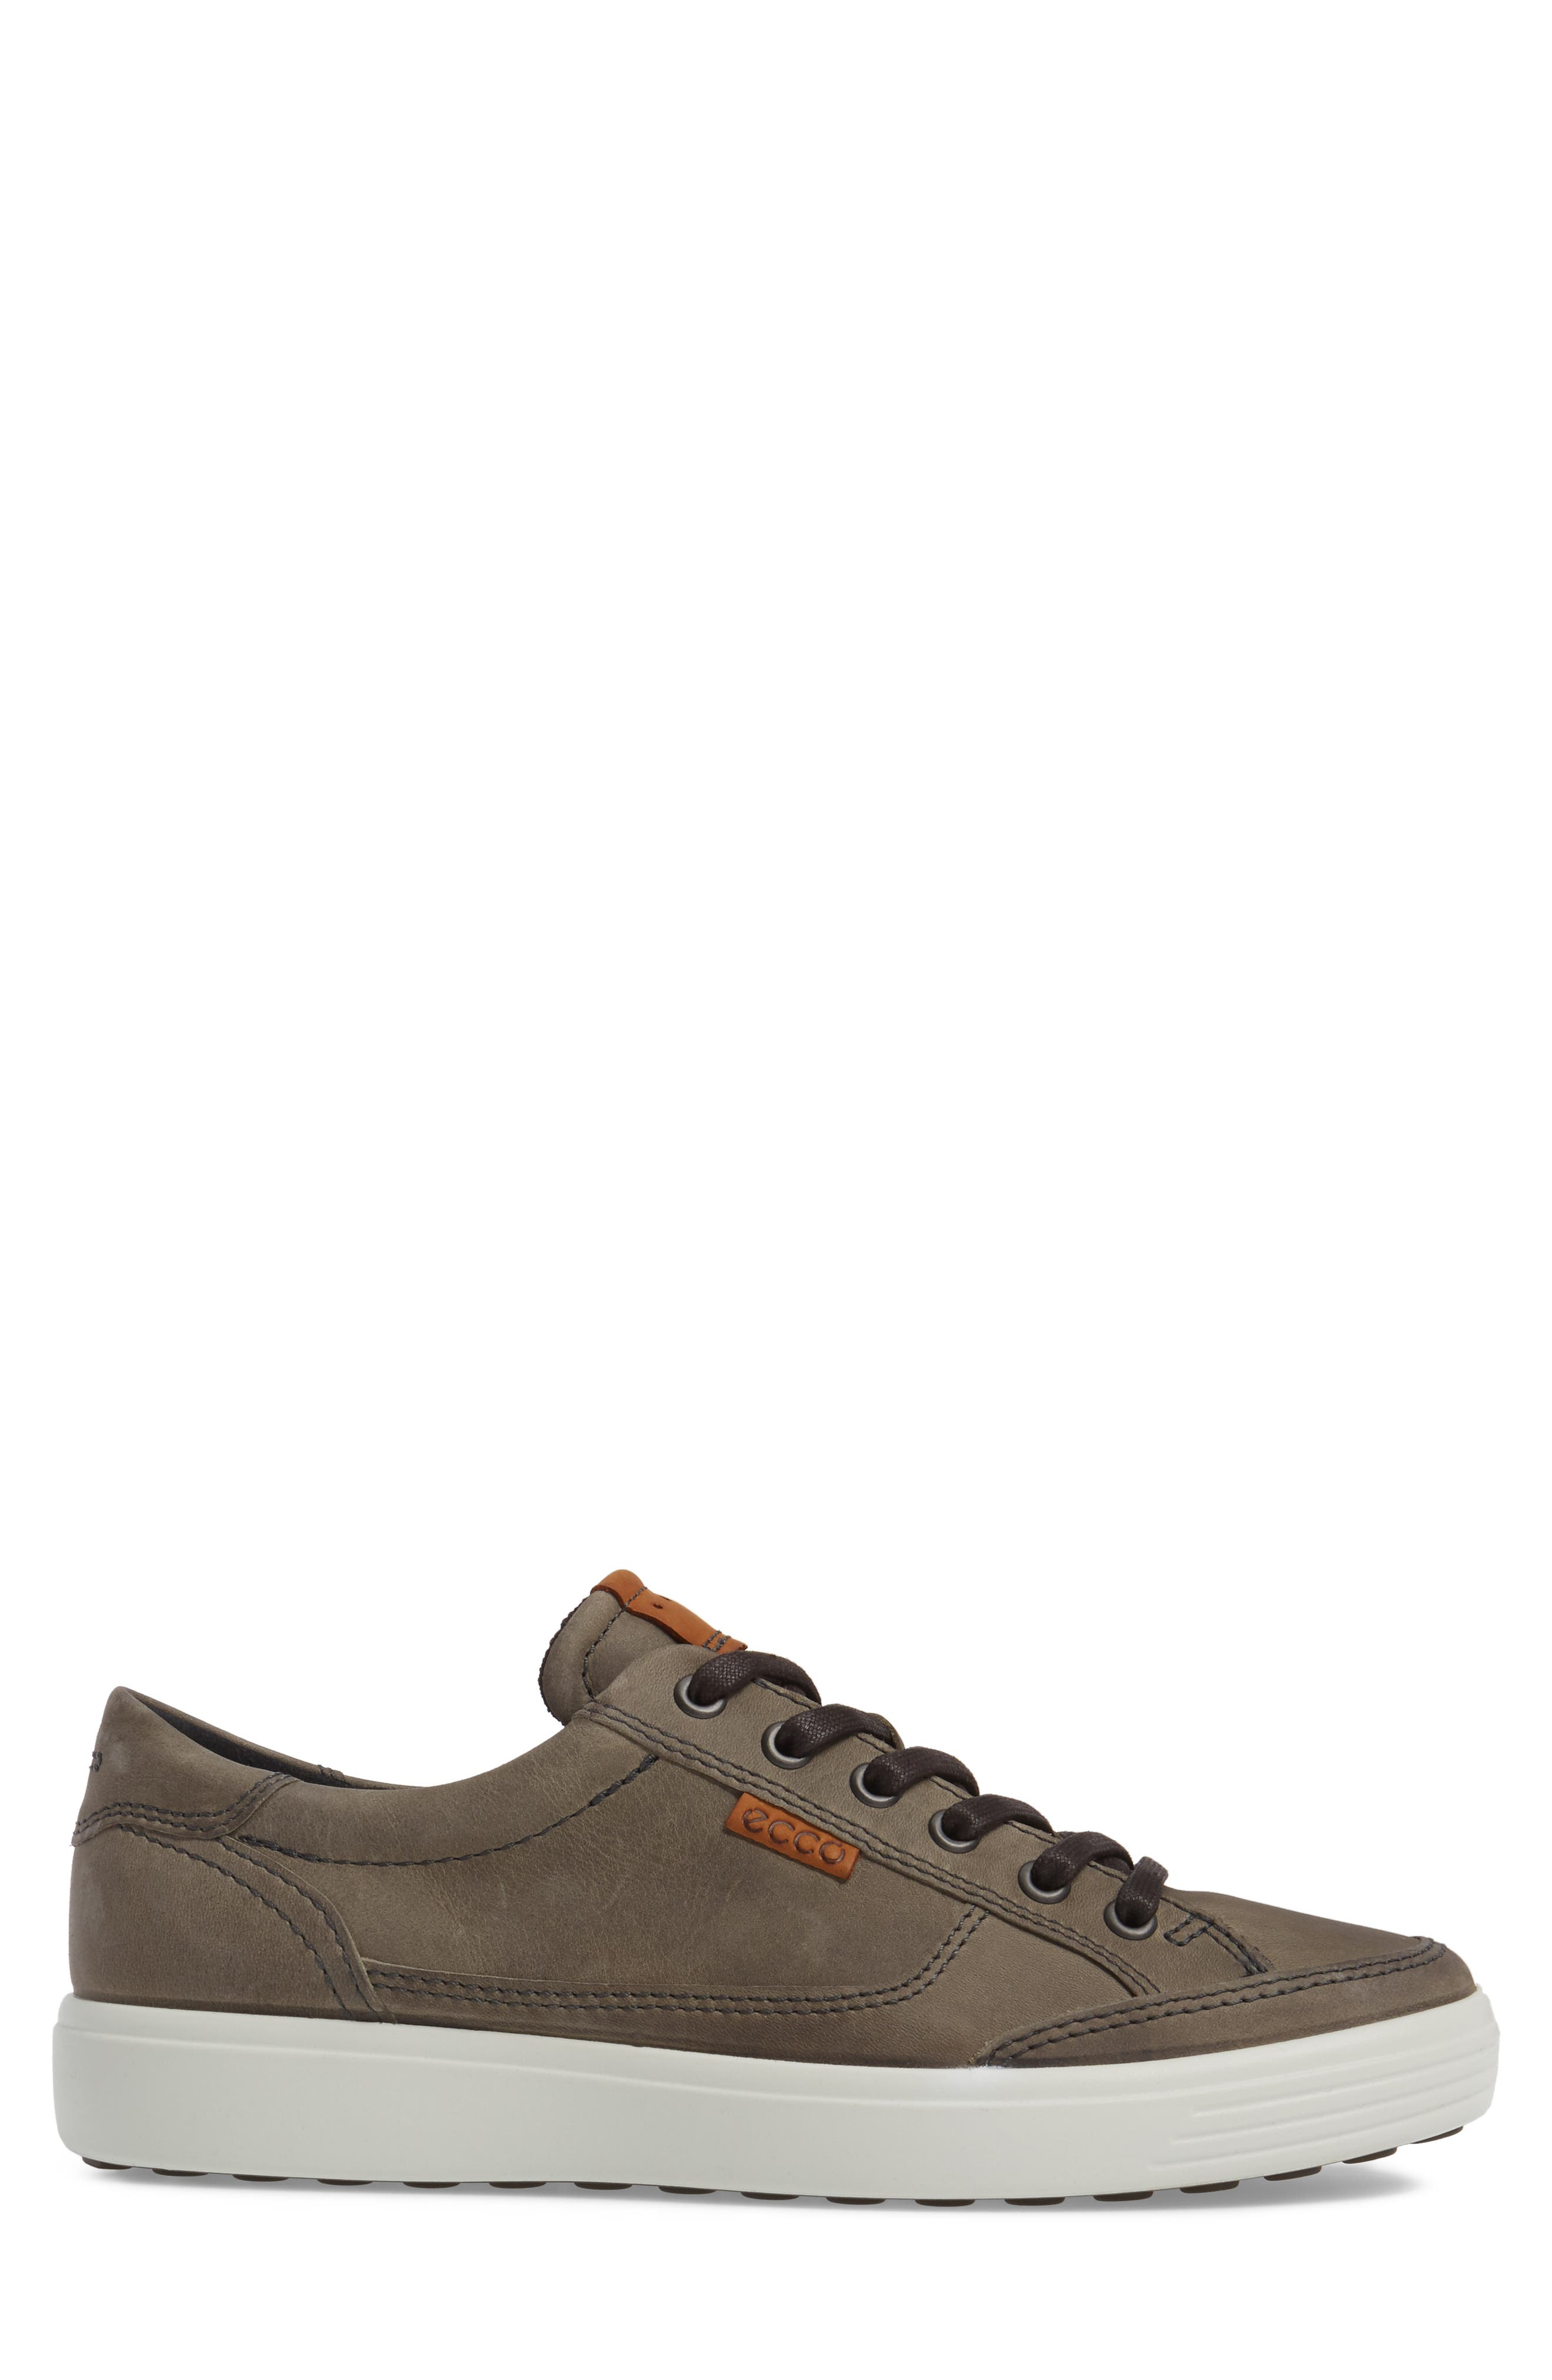 Soft 7 Sneaker,                             Alternate thumbnail 3, color,                             Wild Dove Leather